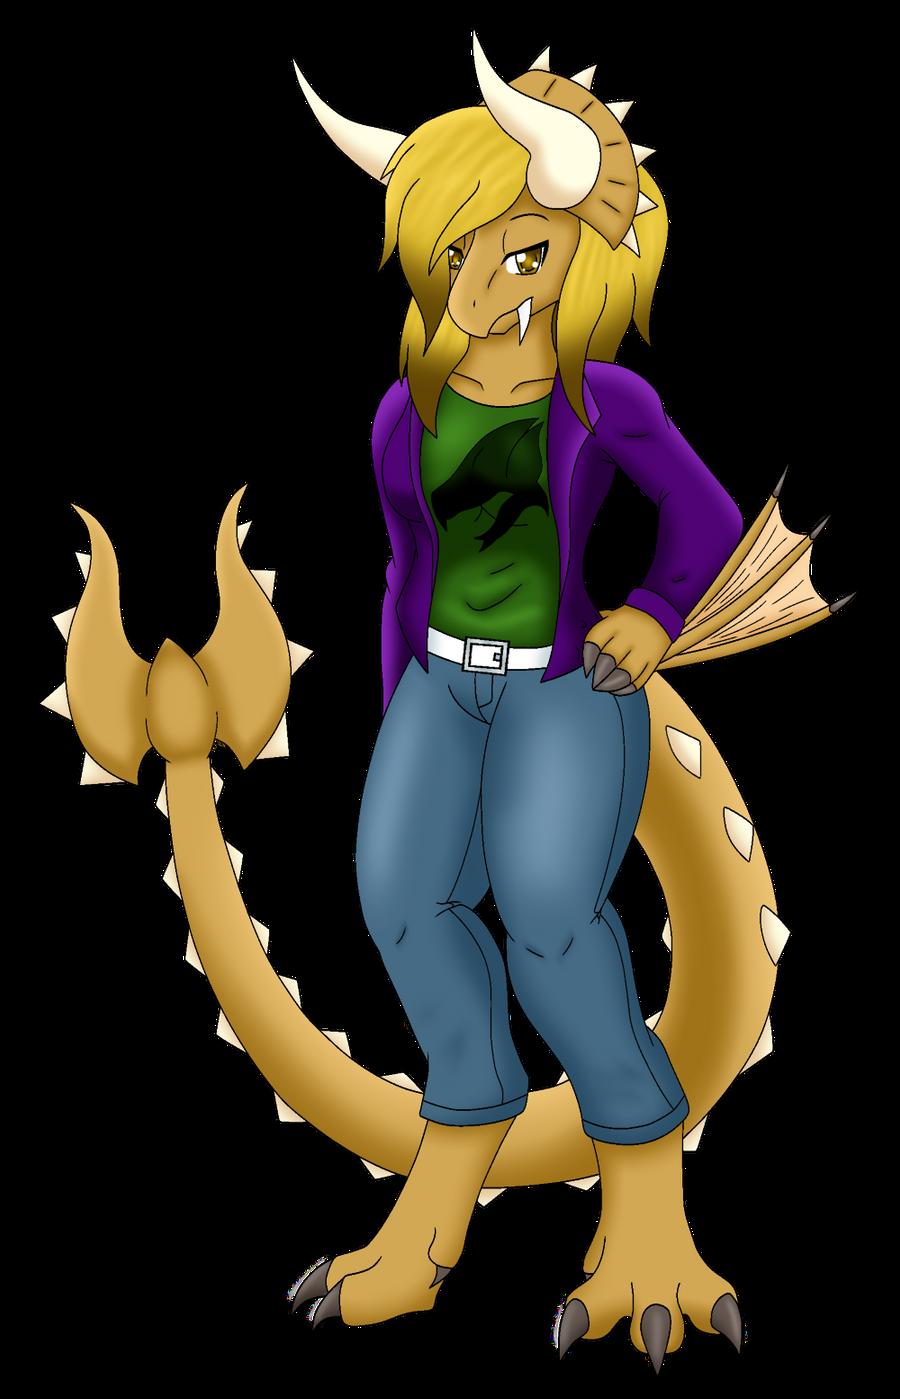 Tifa Lockhorn by Kimerasaurus